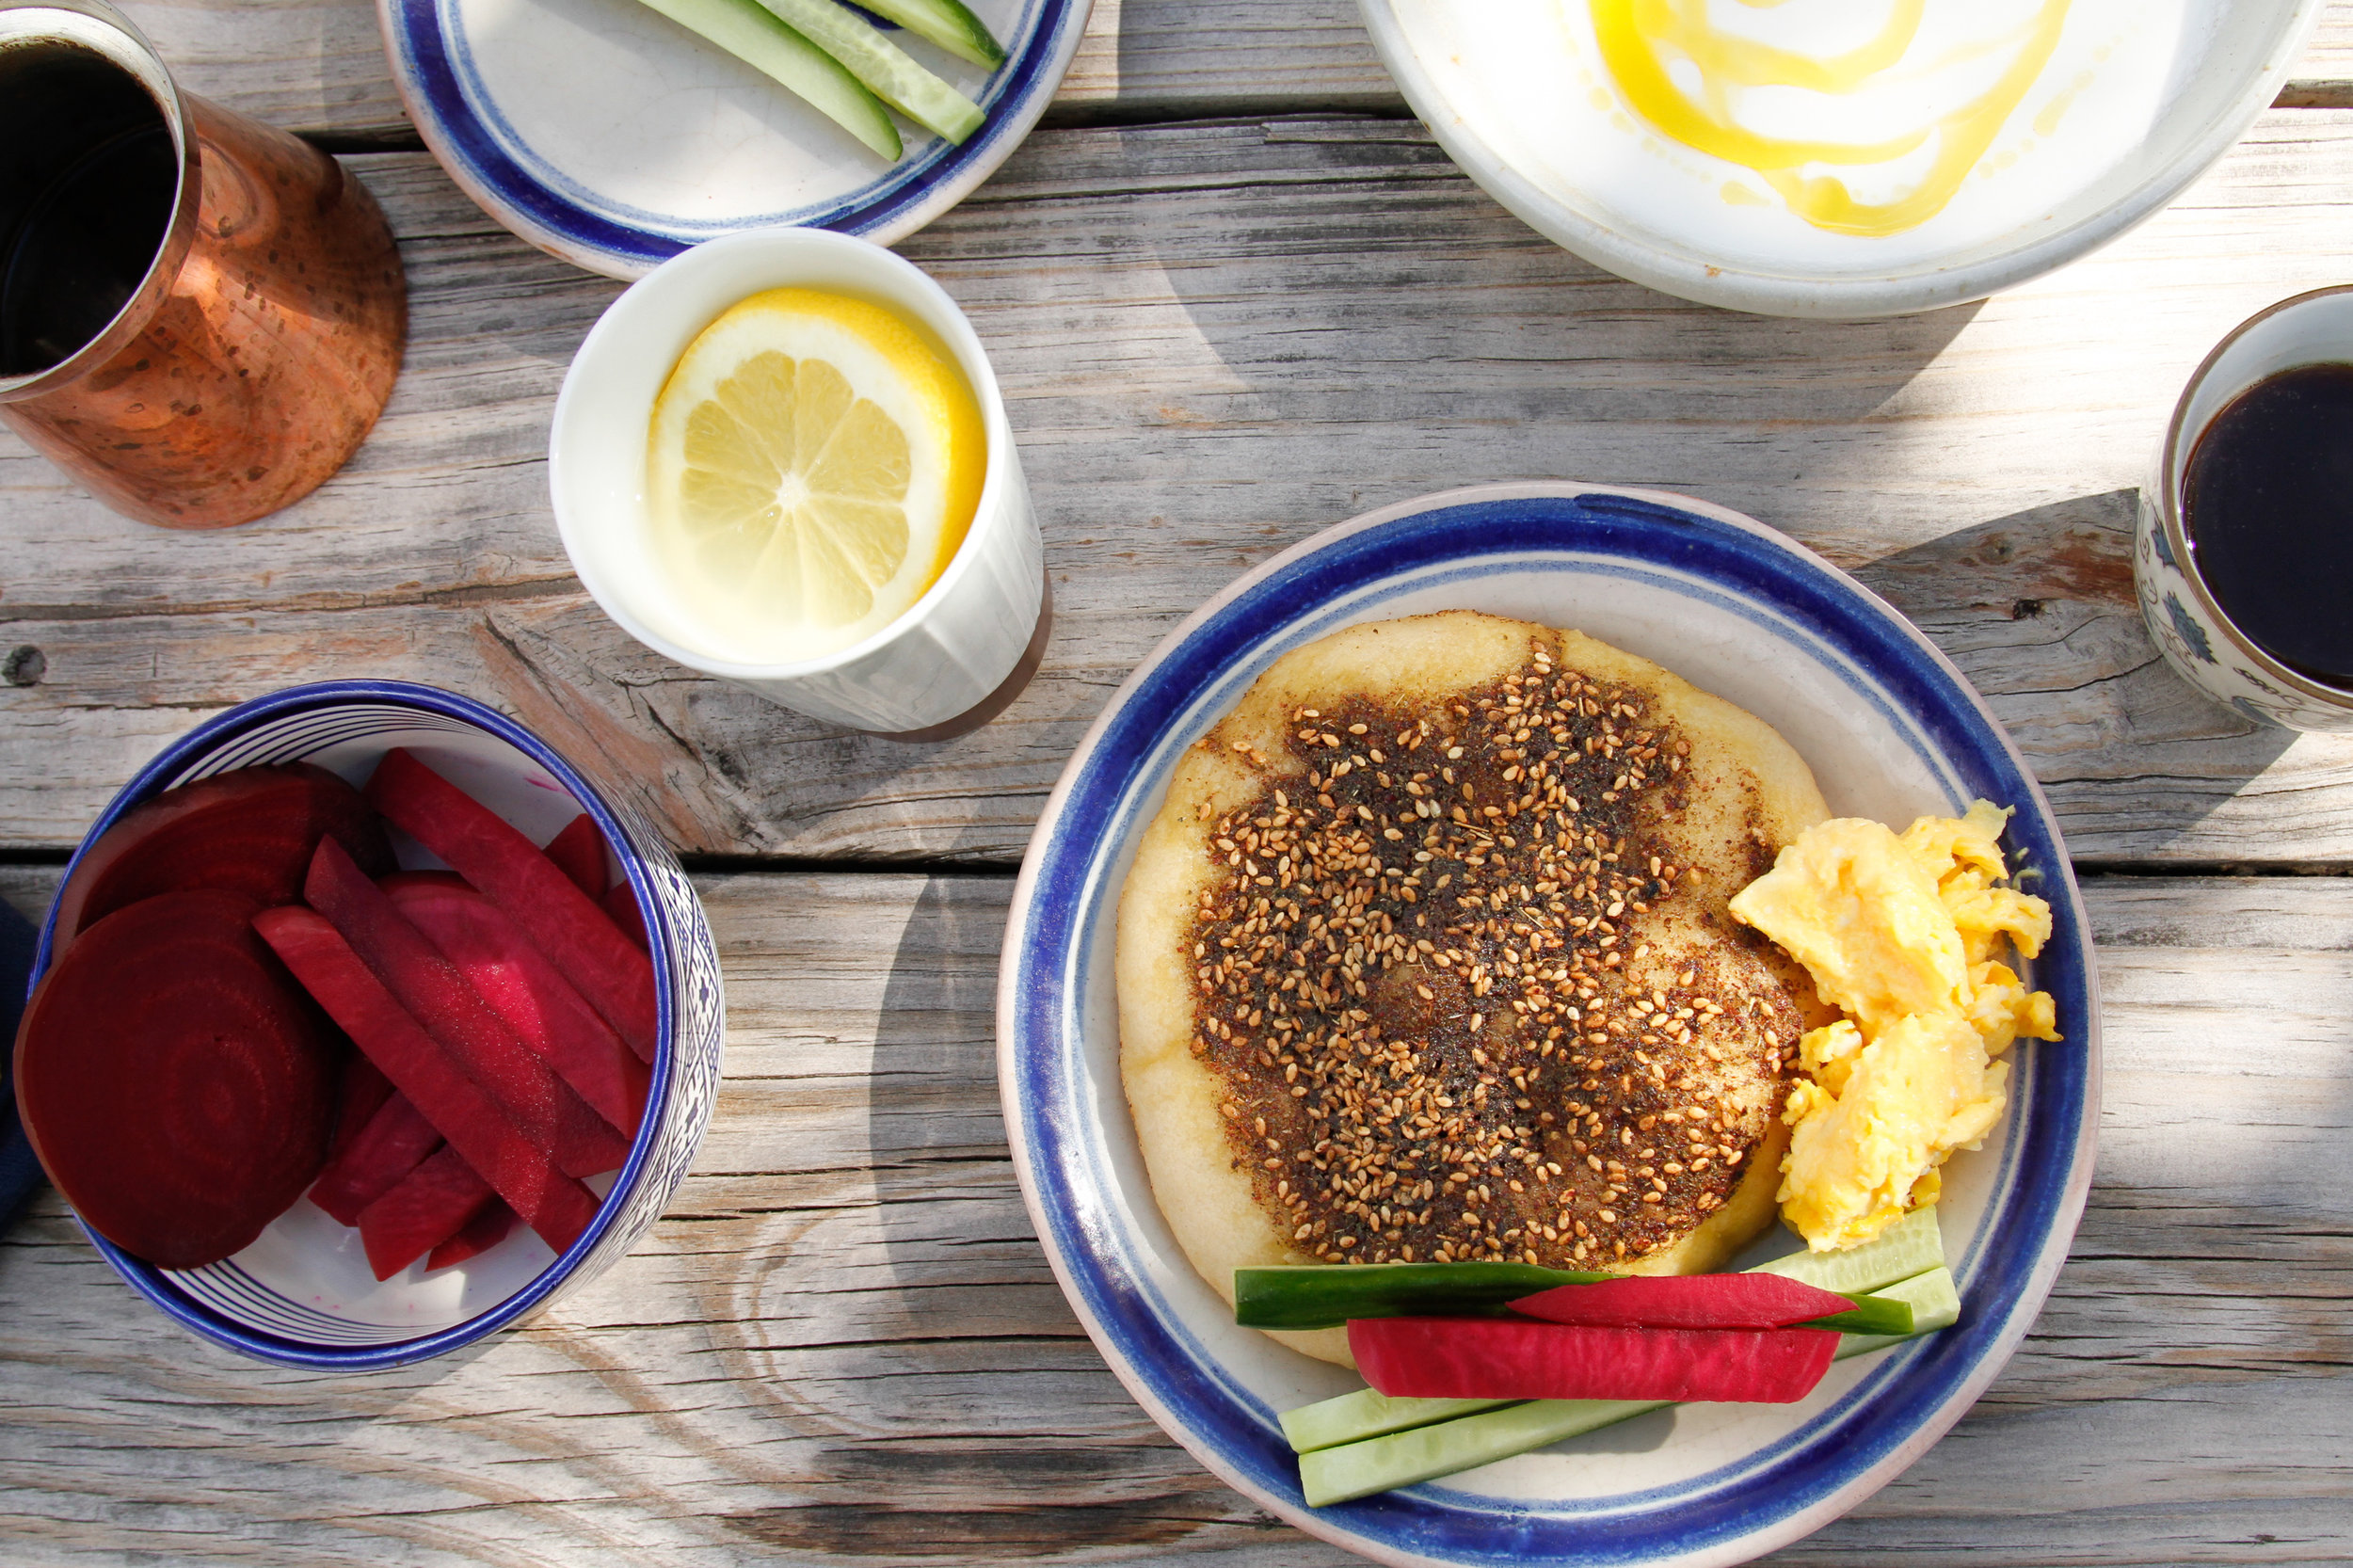 BreakfastPlate_H.jpg